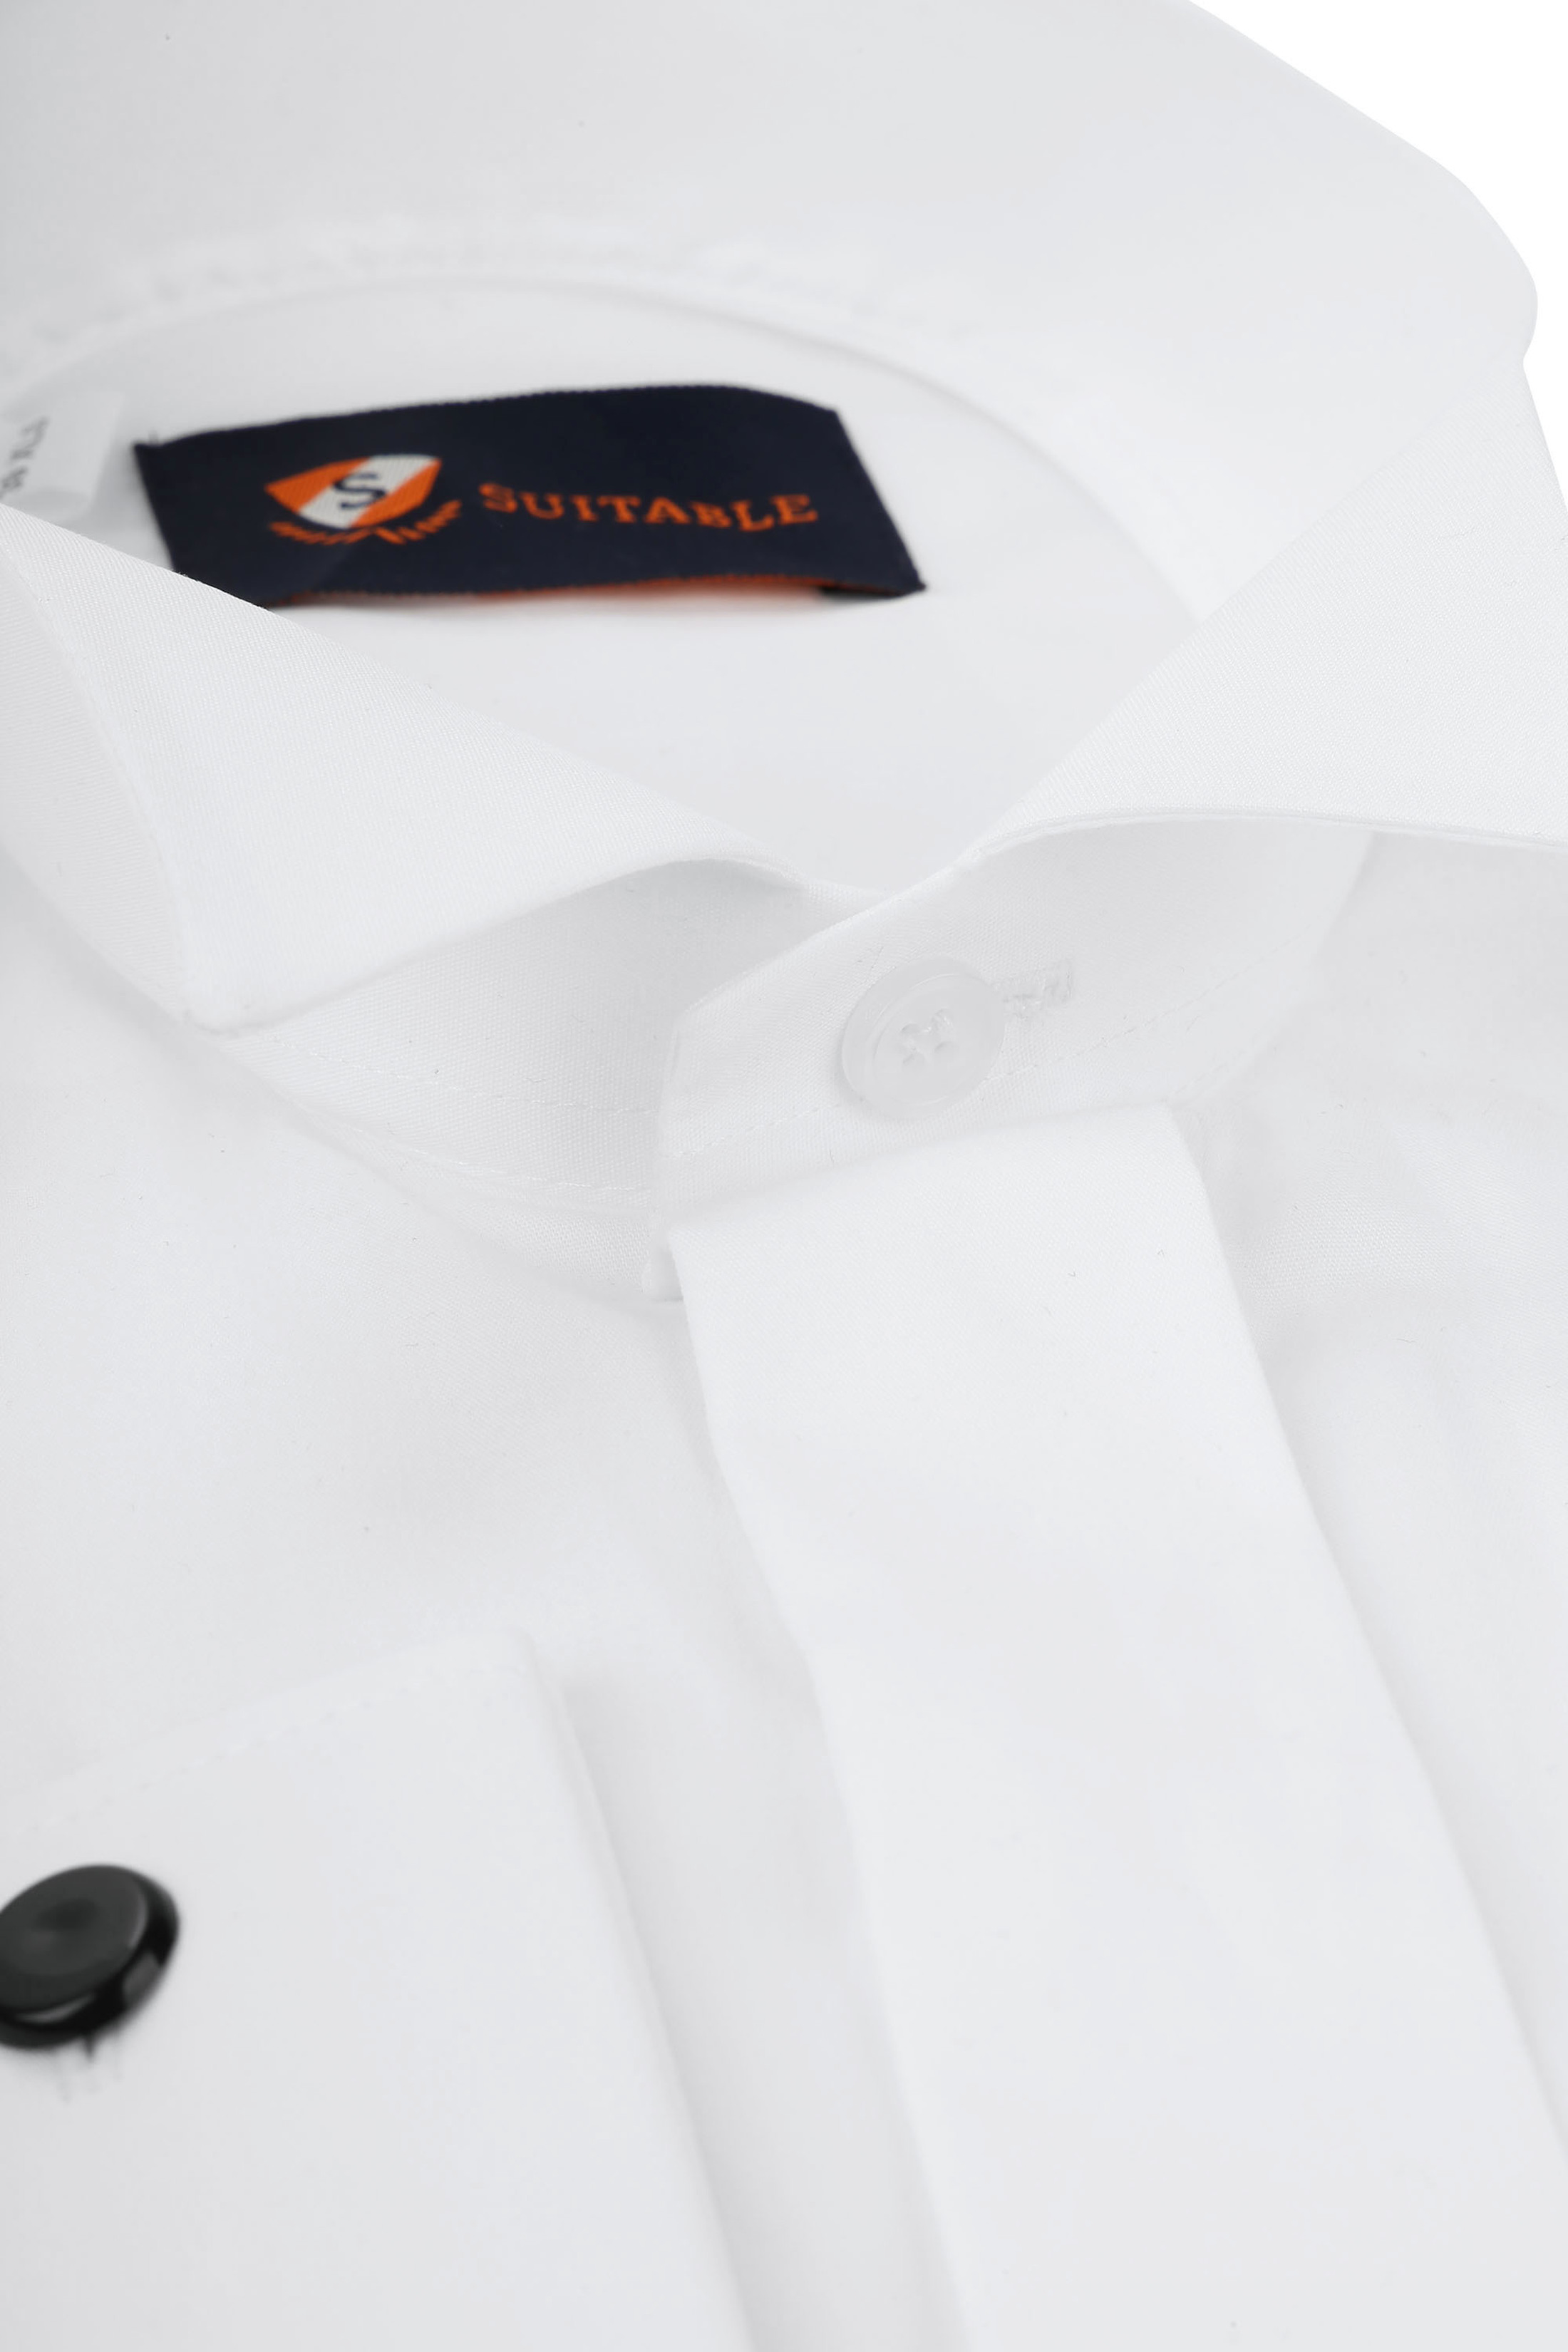 Tuxedo Shirt High Collar White photo 1